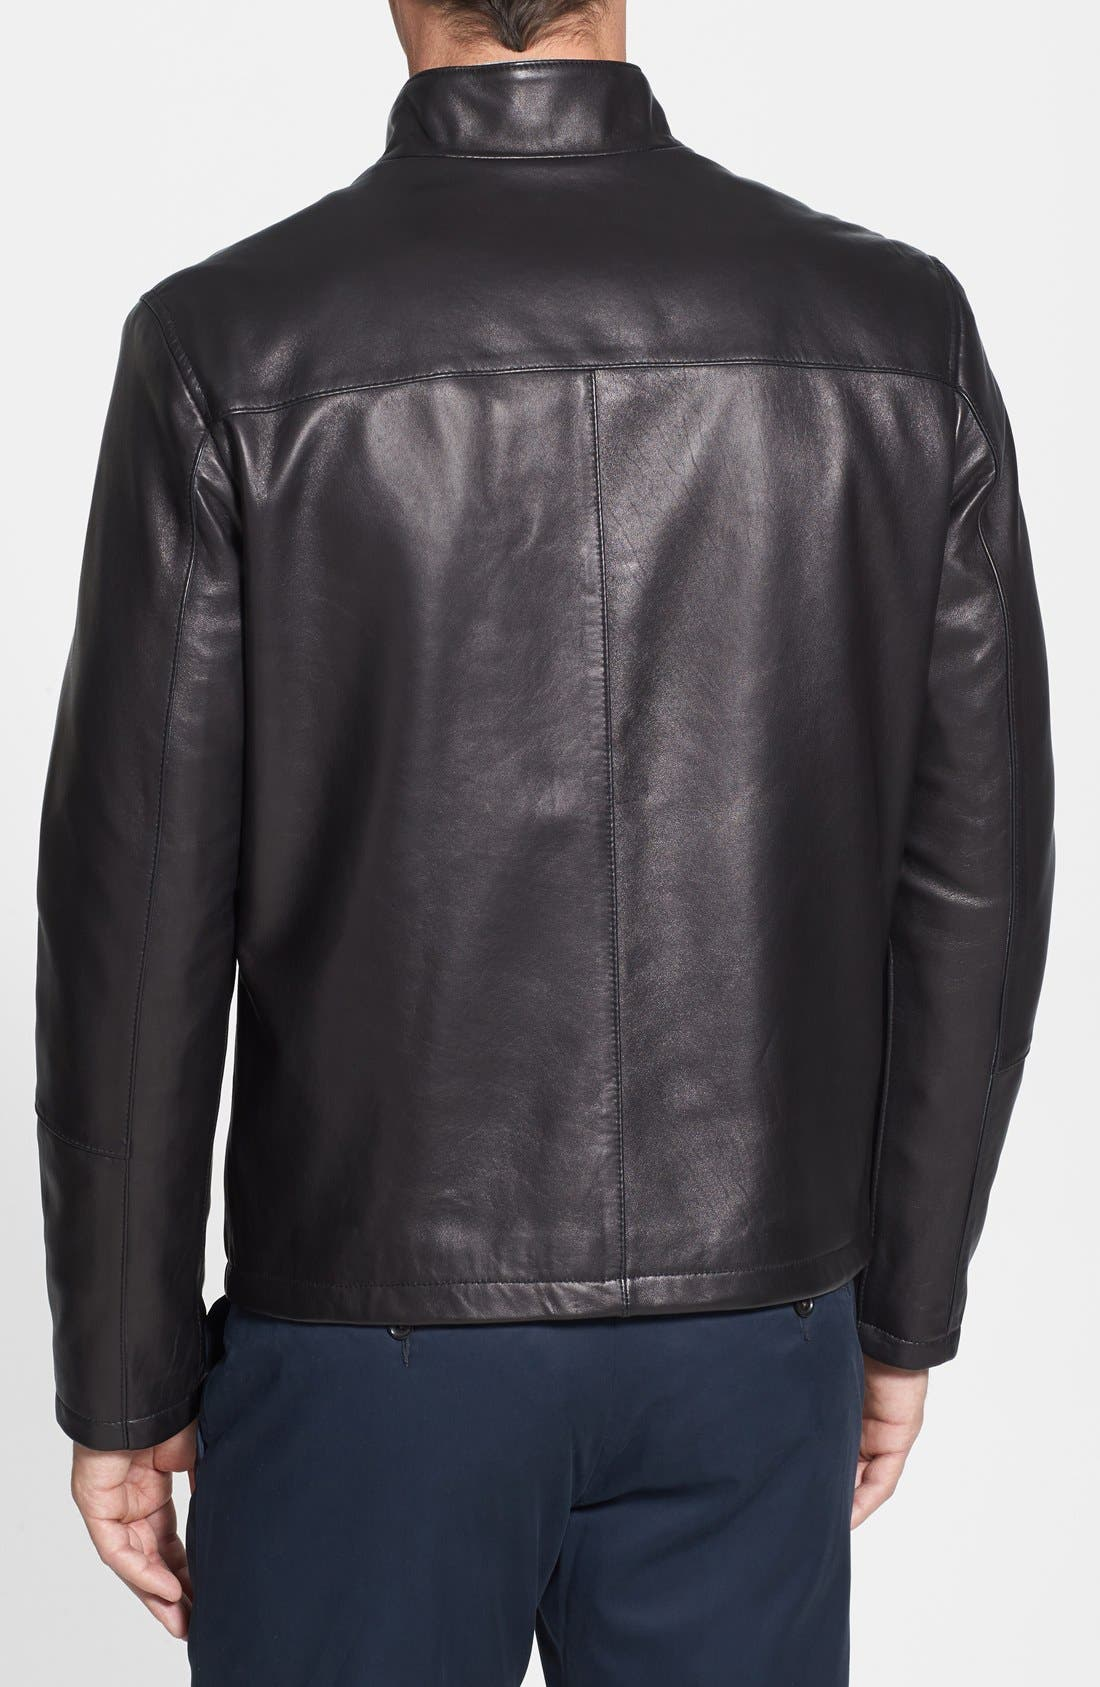 COLE HAAN, Lambskin Leather Moto Jacket, Alternate thumbnail 4, color, BLACK